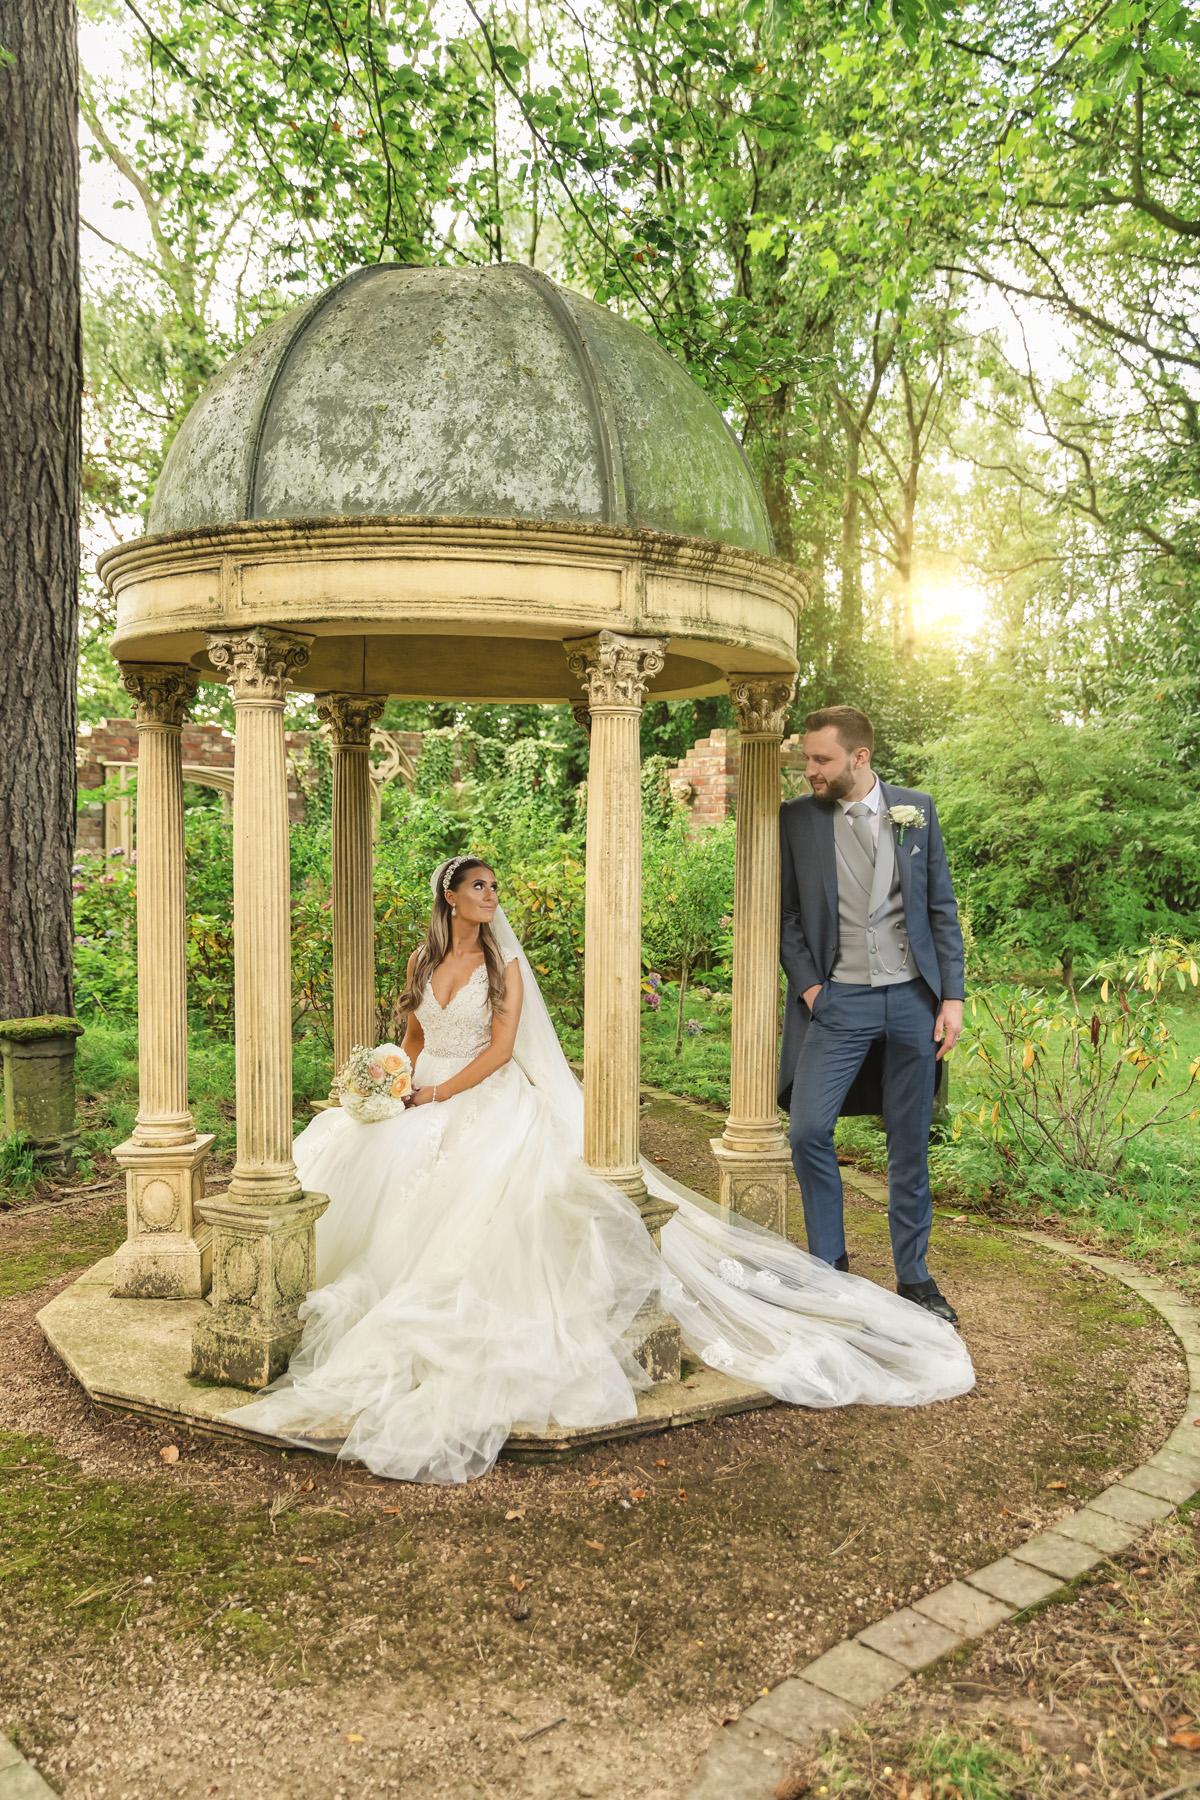 Moxhall wedding photography; Beautiful sunset photo of bride & groom under a stone domed gazebo